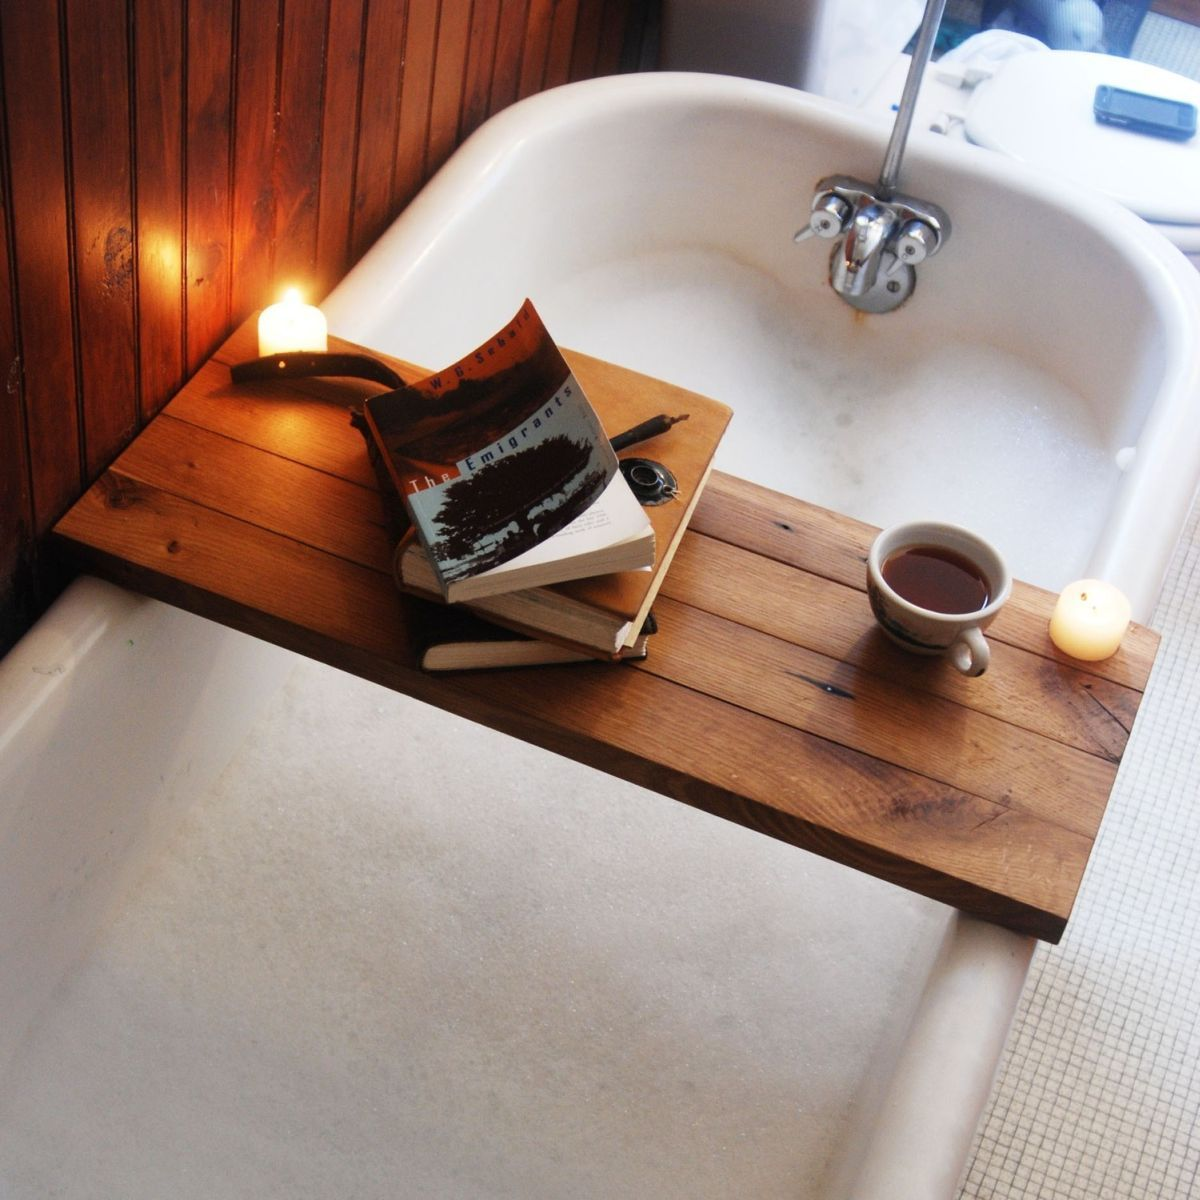 How to Make Your Bathroom Feel Like a Spa   Bathtub tray, Bathtubs